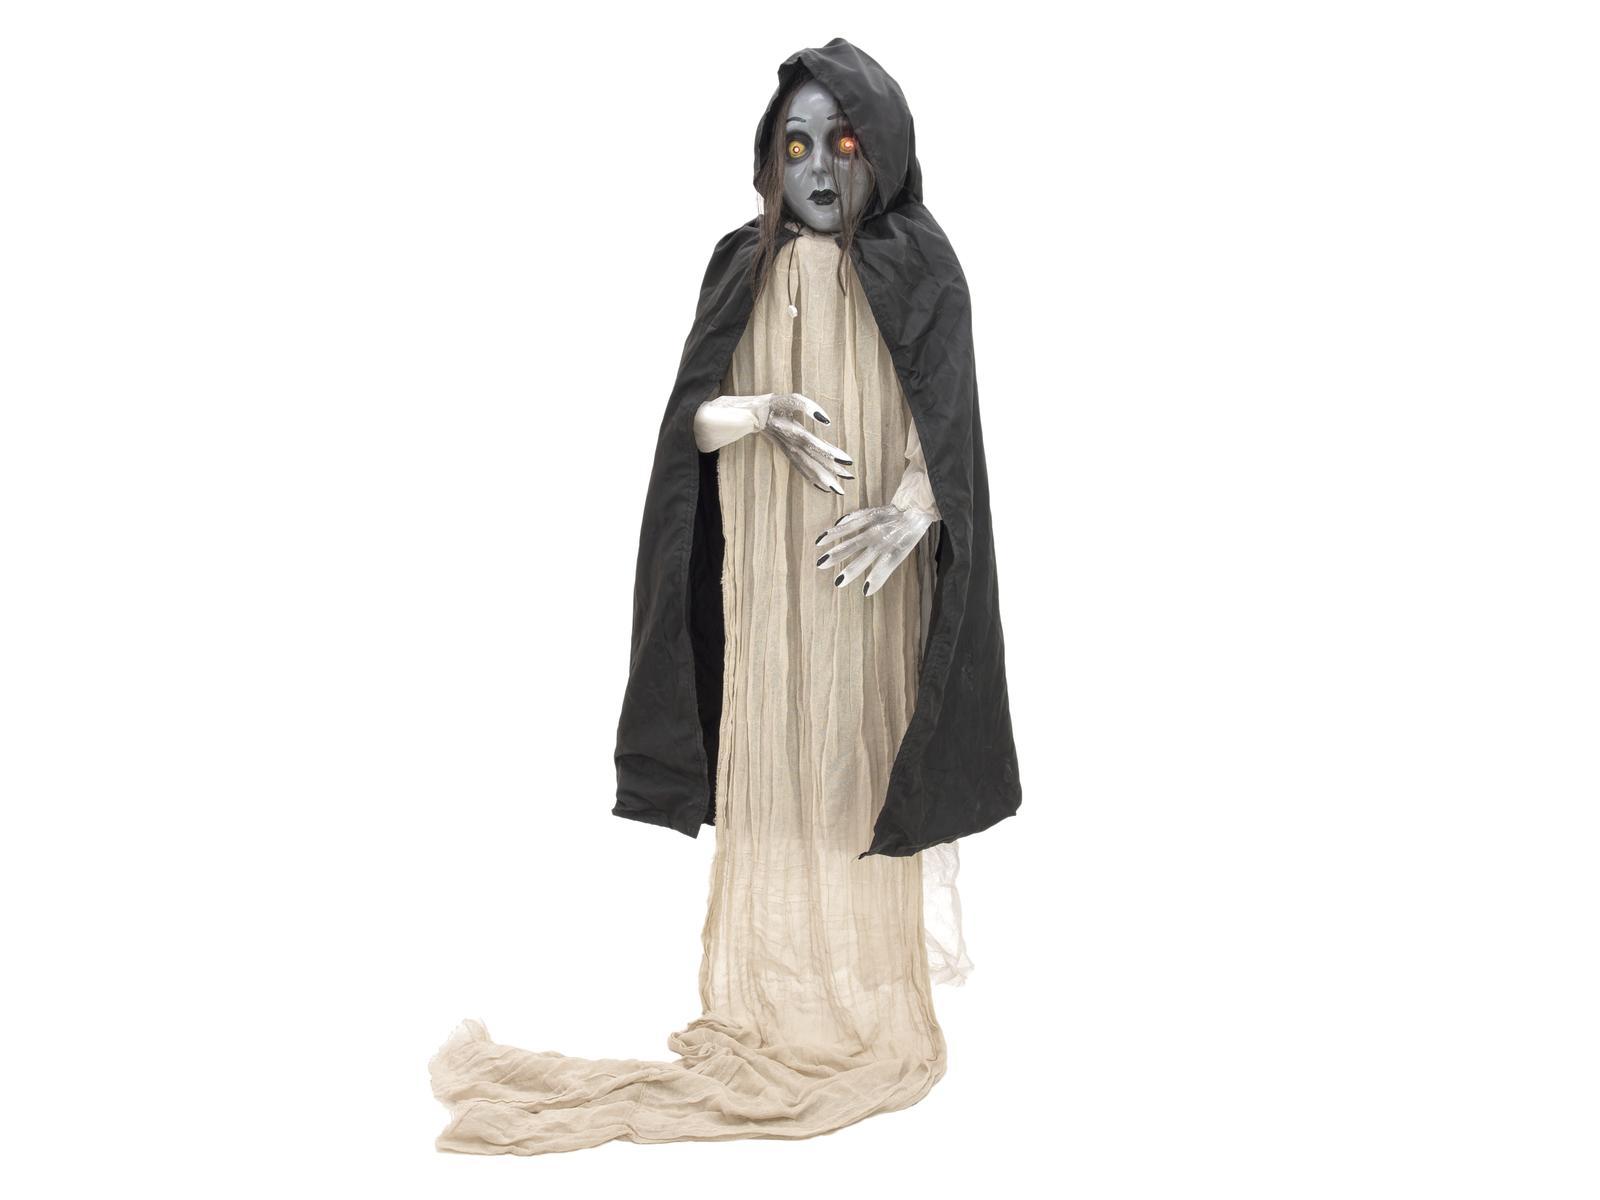 EUROPALMS Halloween ragazza gigante, 275